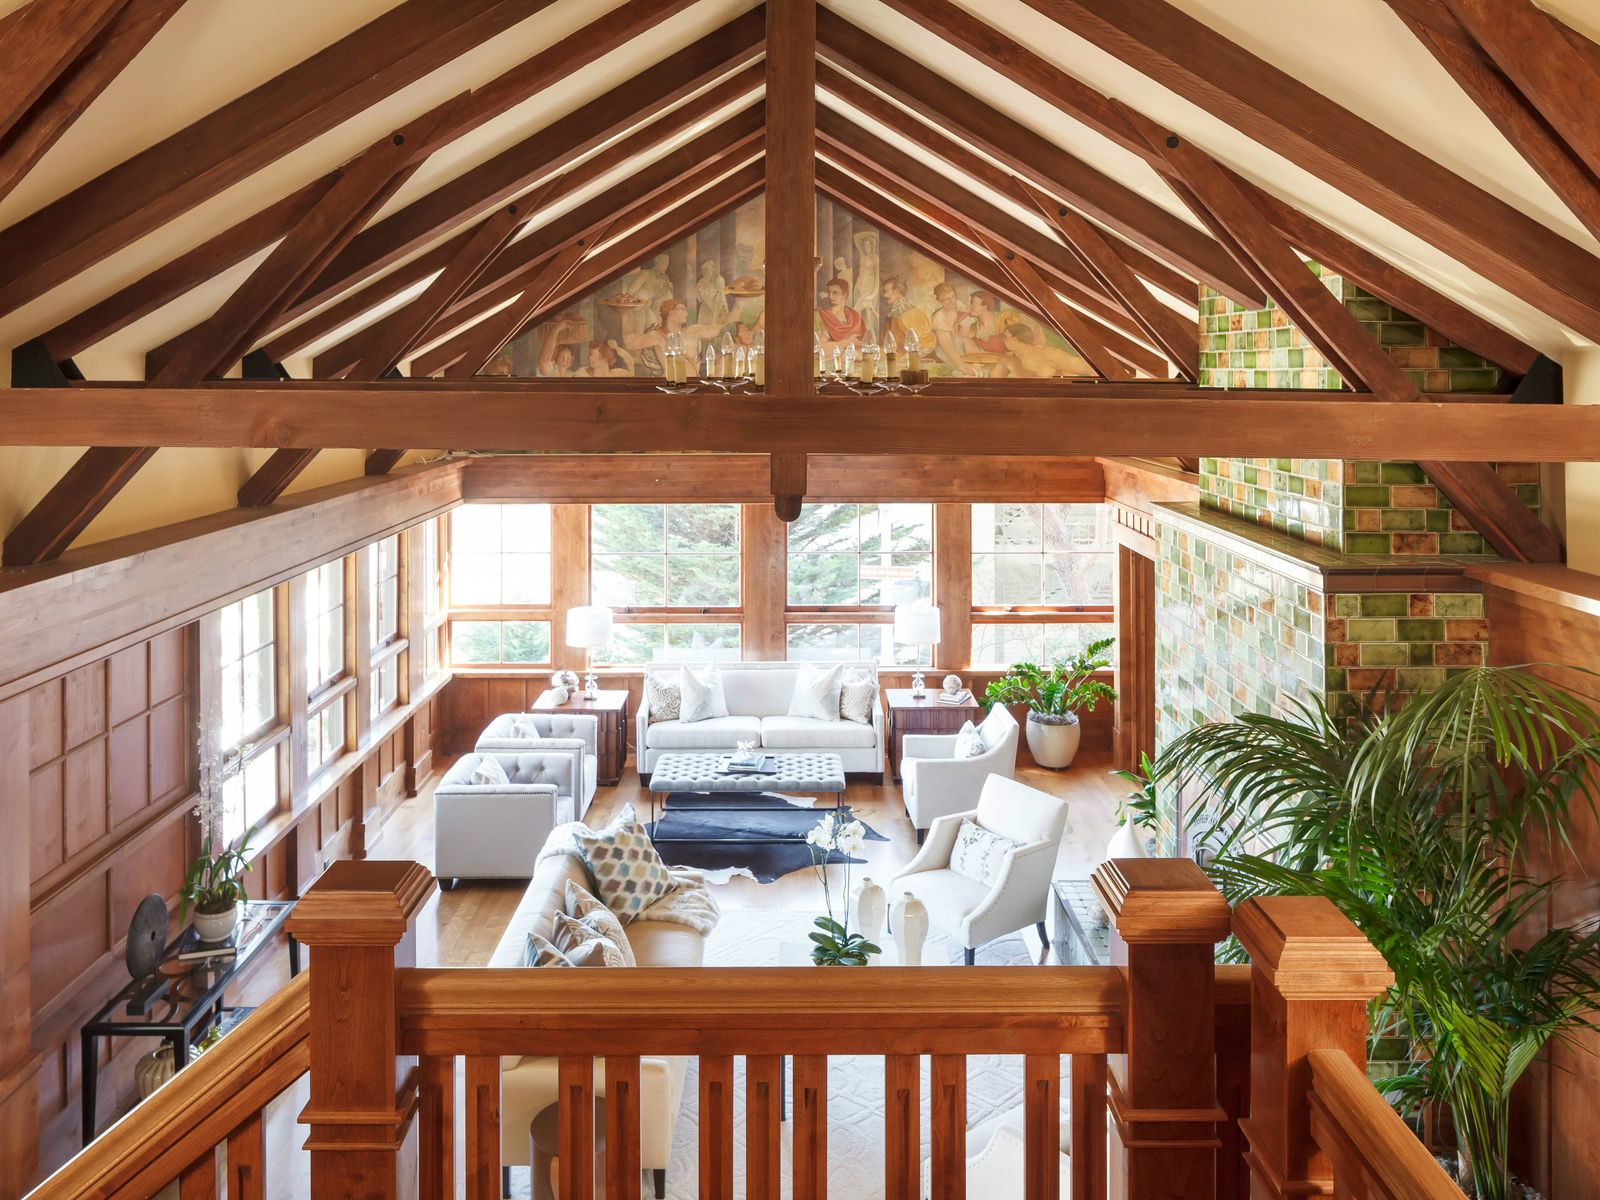 Unique Arts & Crafts Style Home